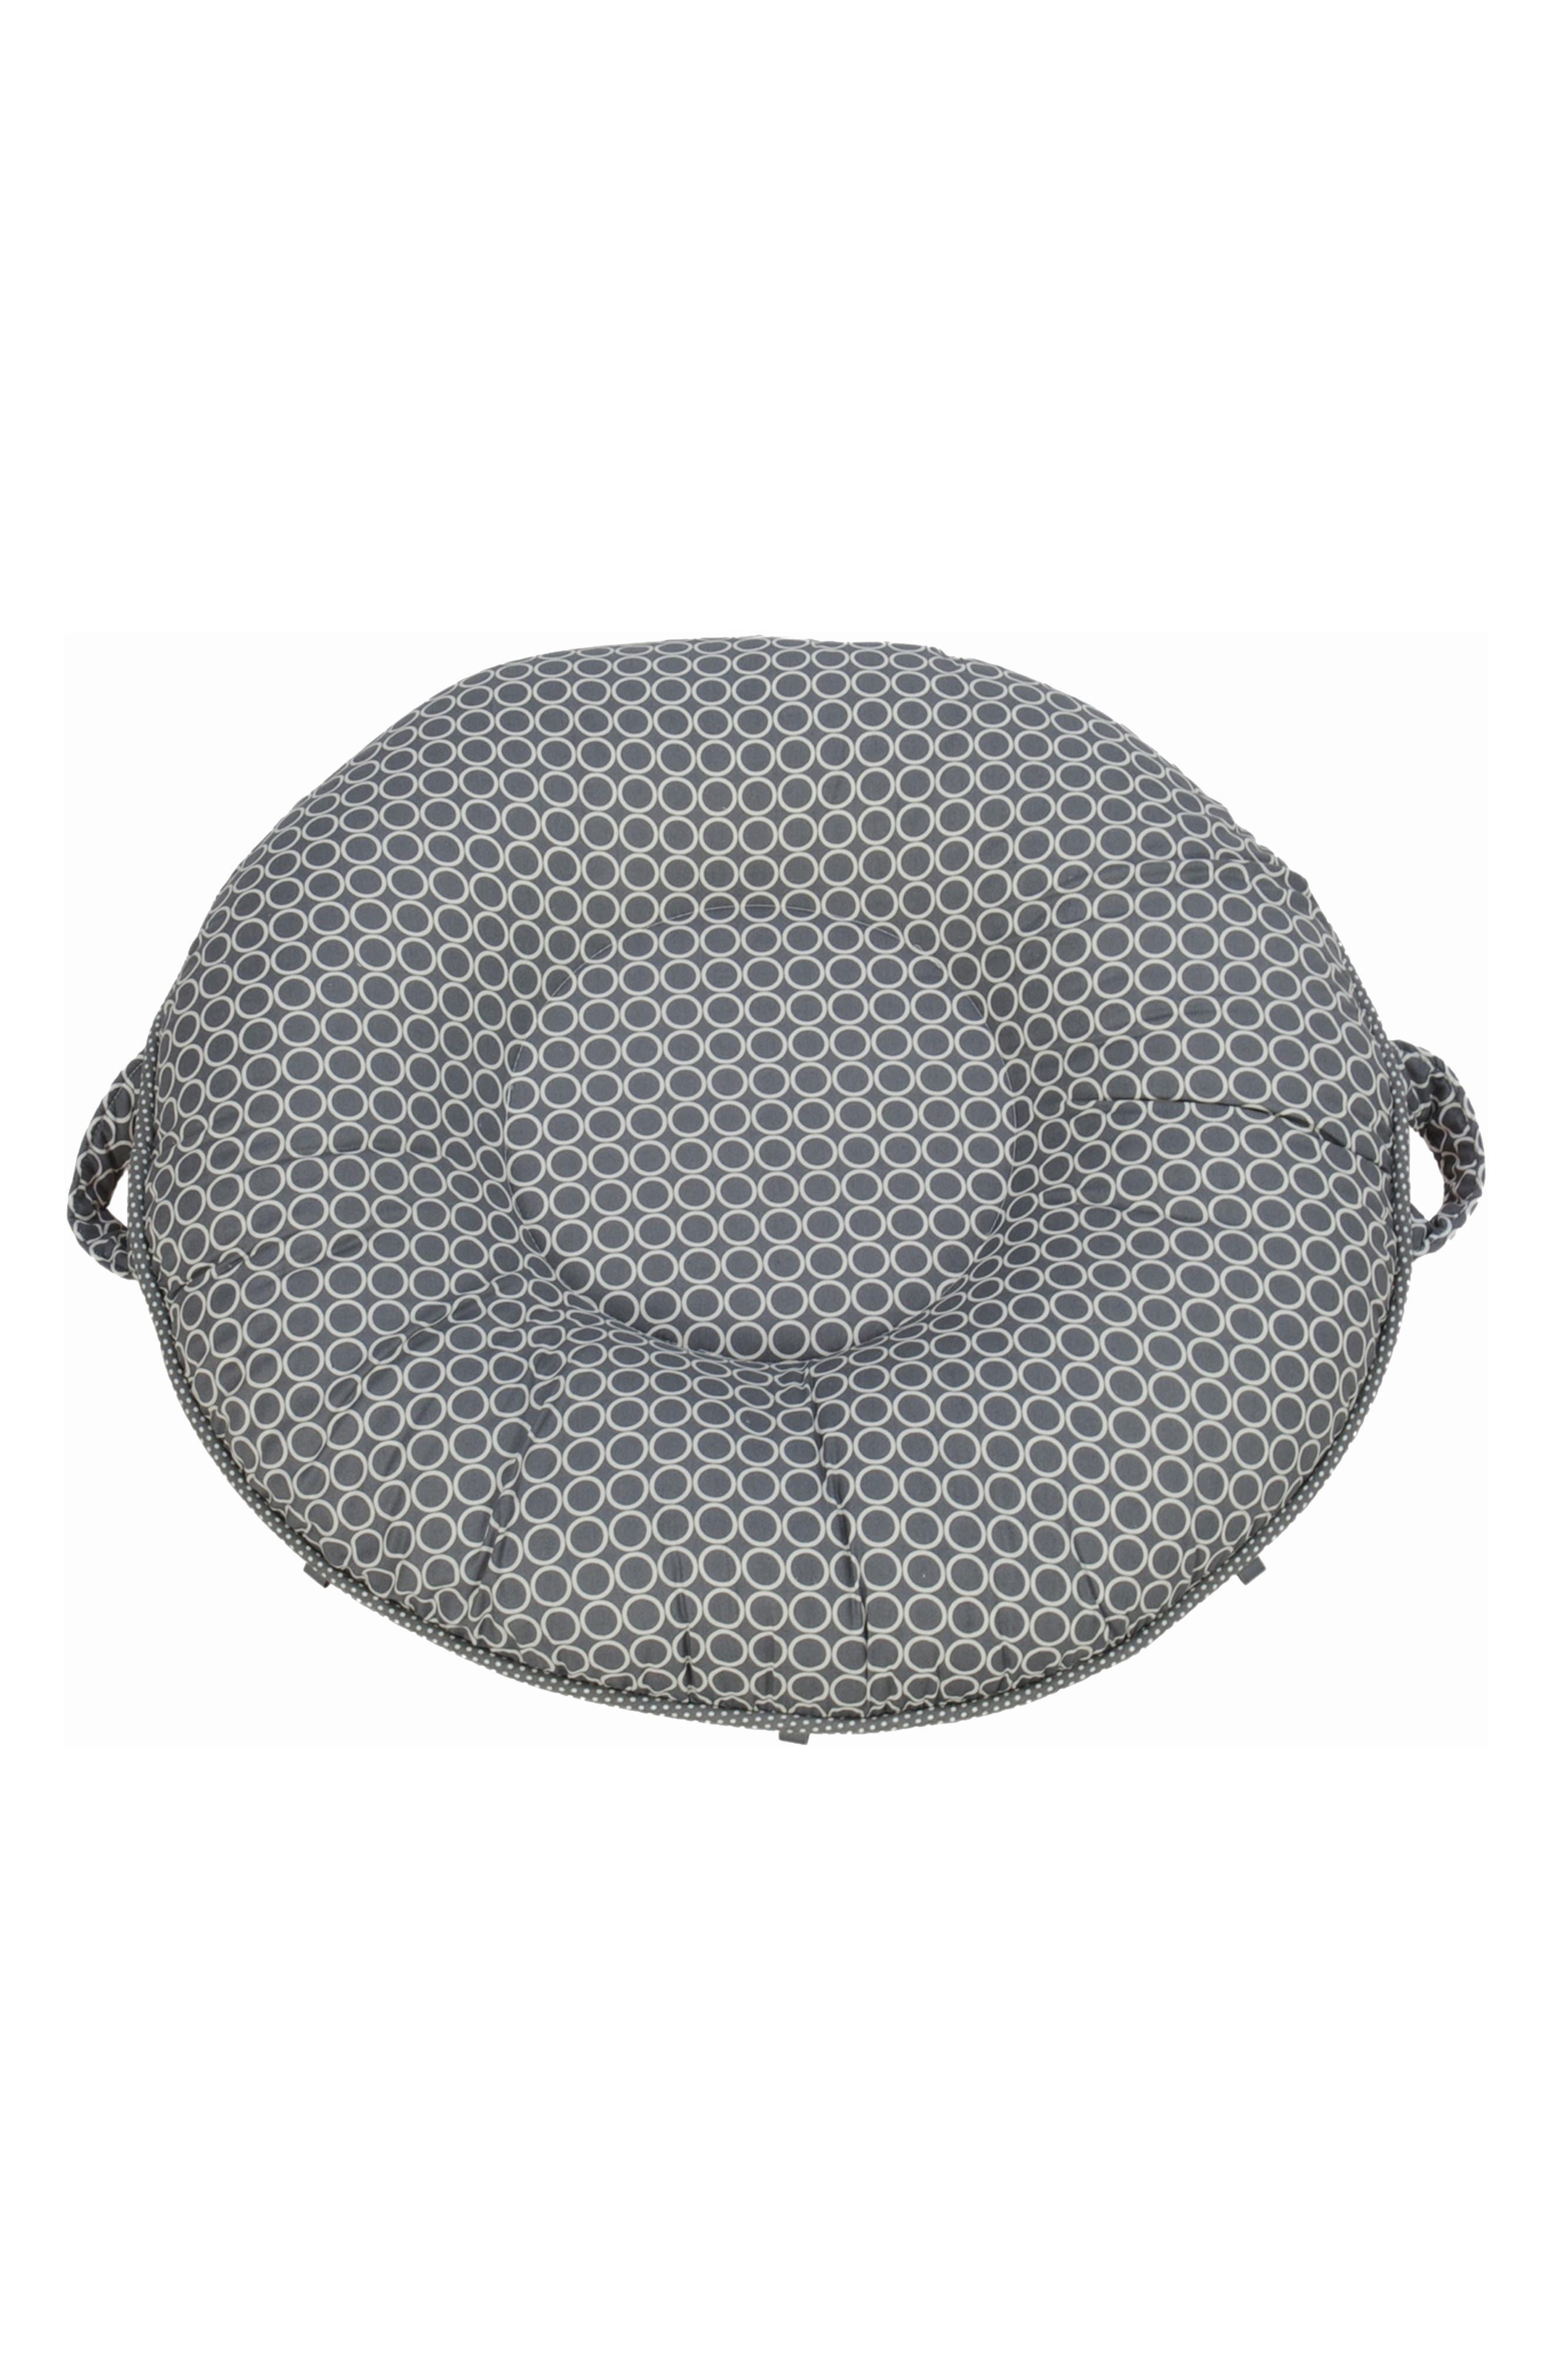 Main Image - Pello Majestic Luxe Portable Floor Pillow (Baby)